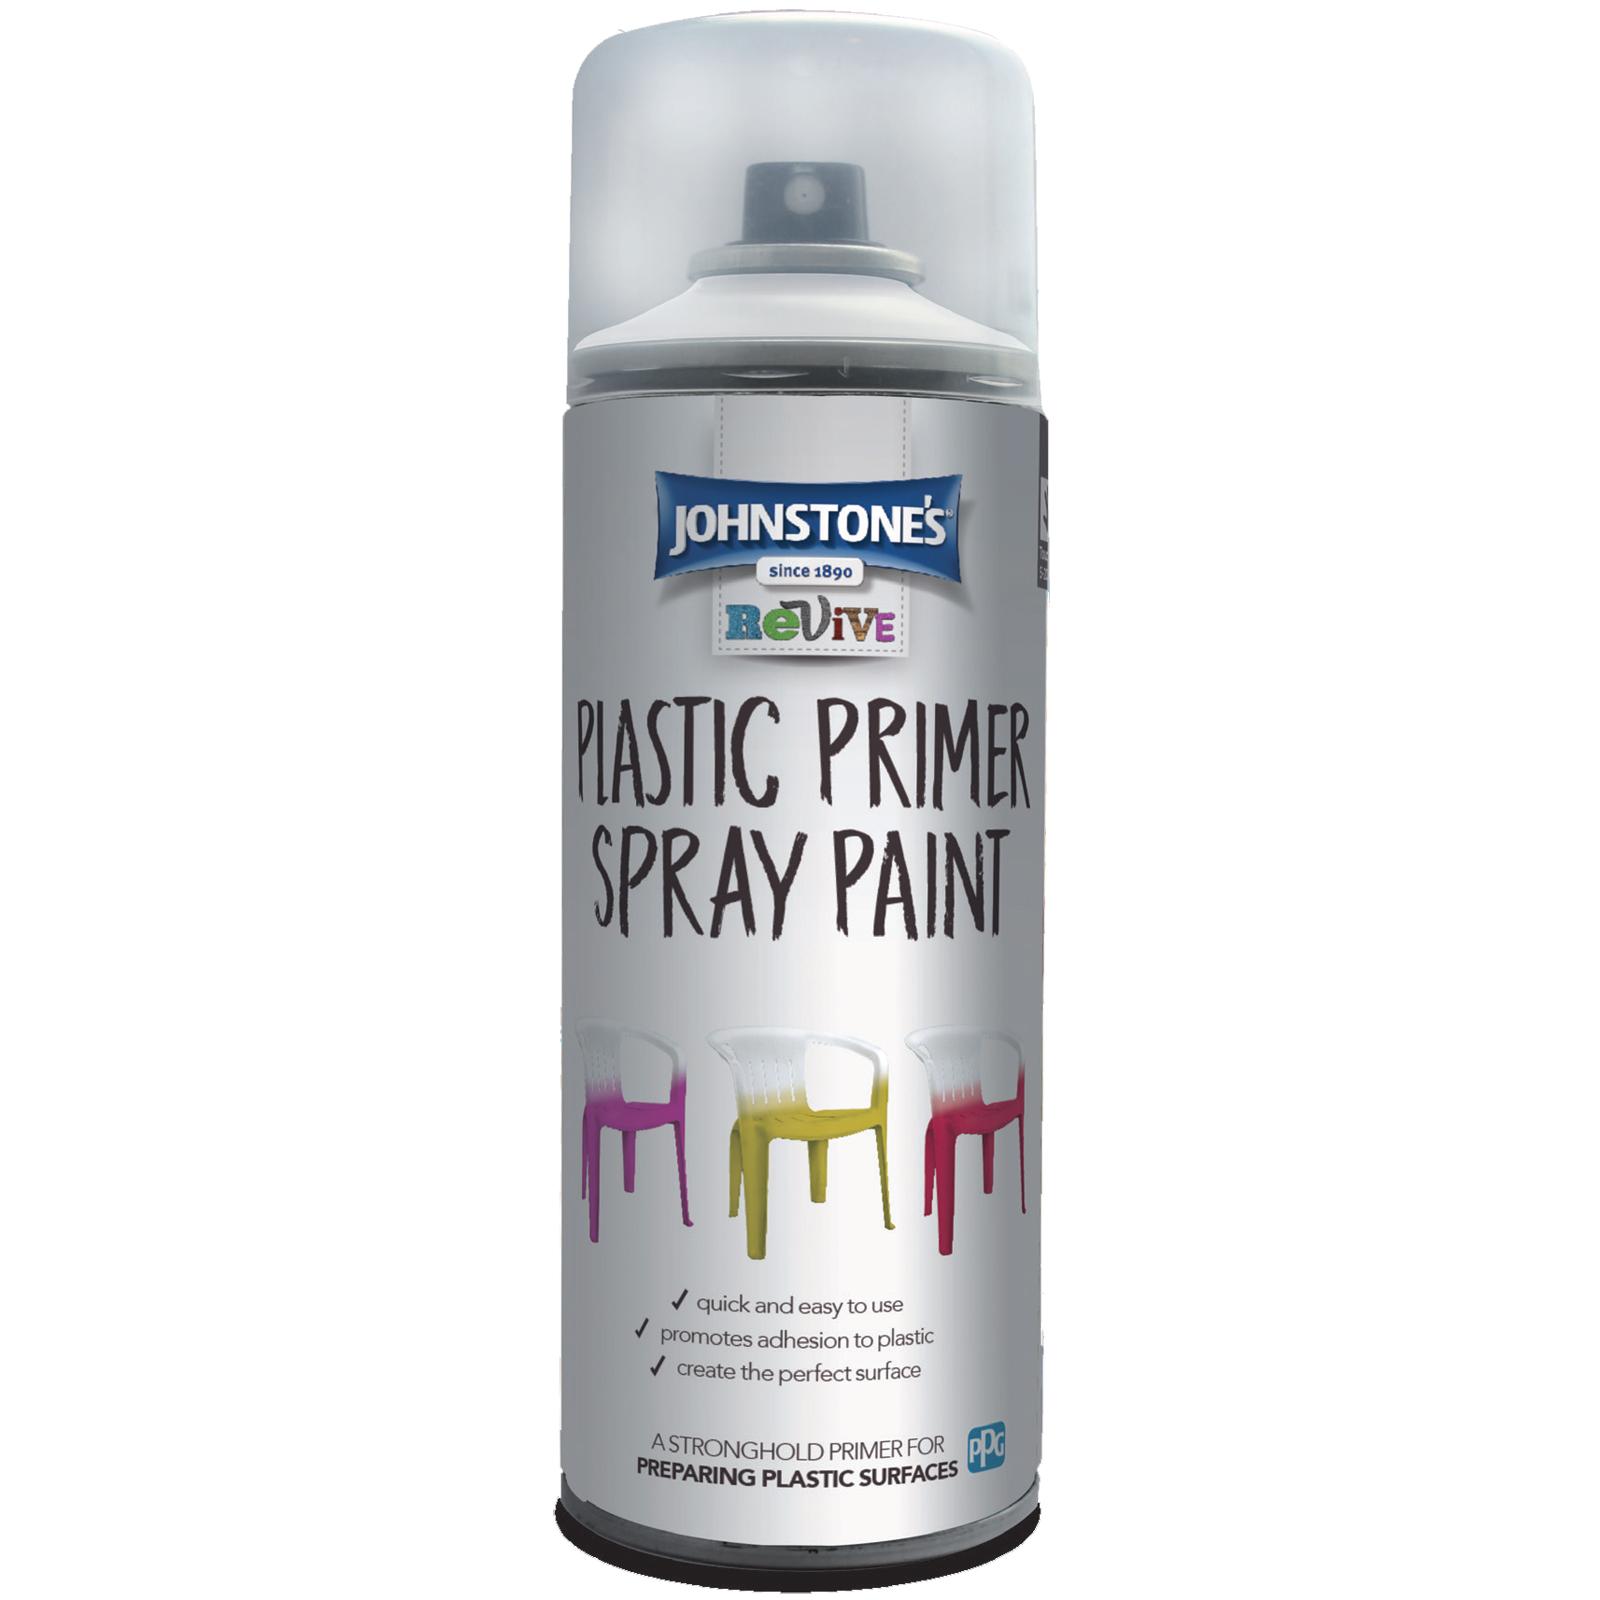 PLASTIC PRIMER SPRAY PAINT CLEAR WHITE